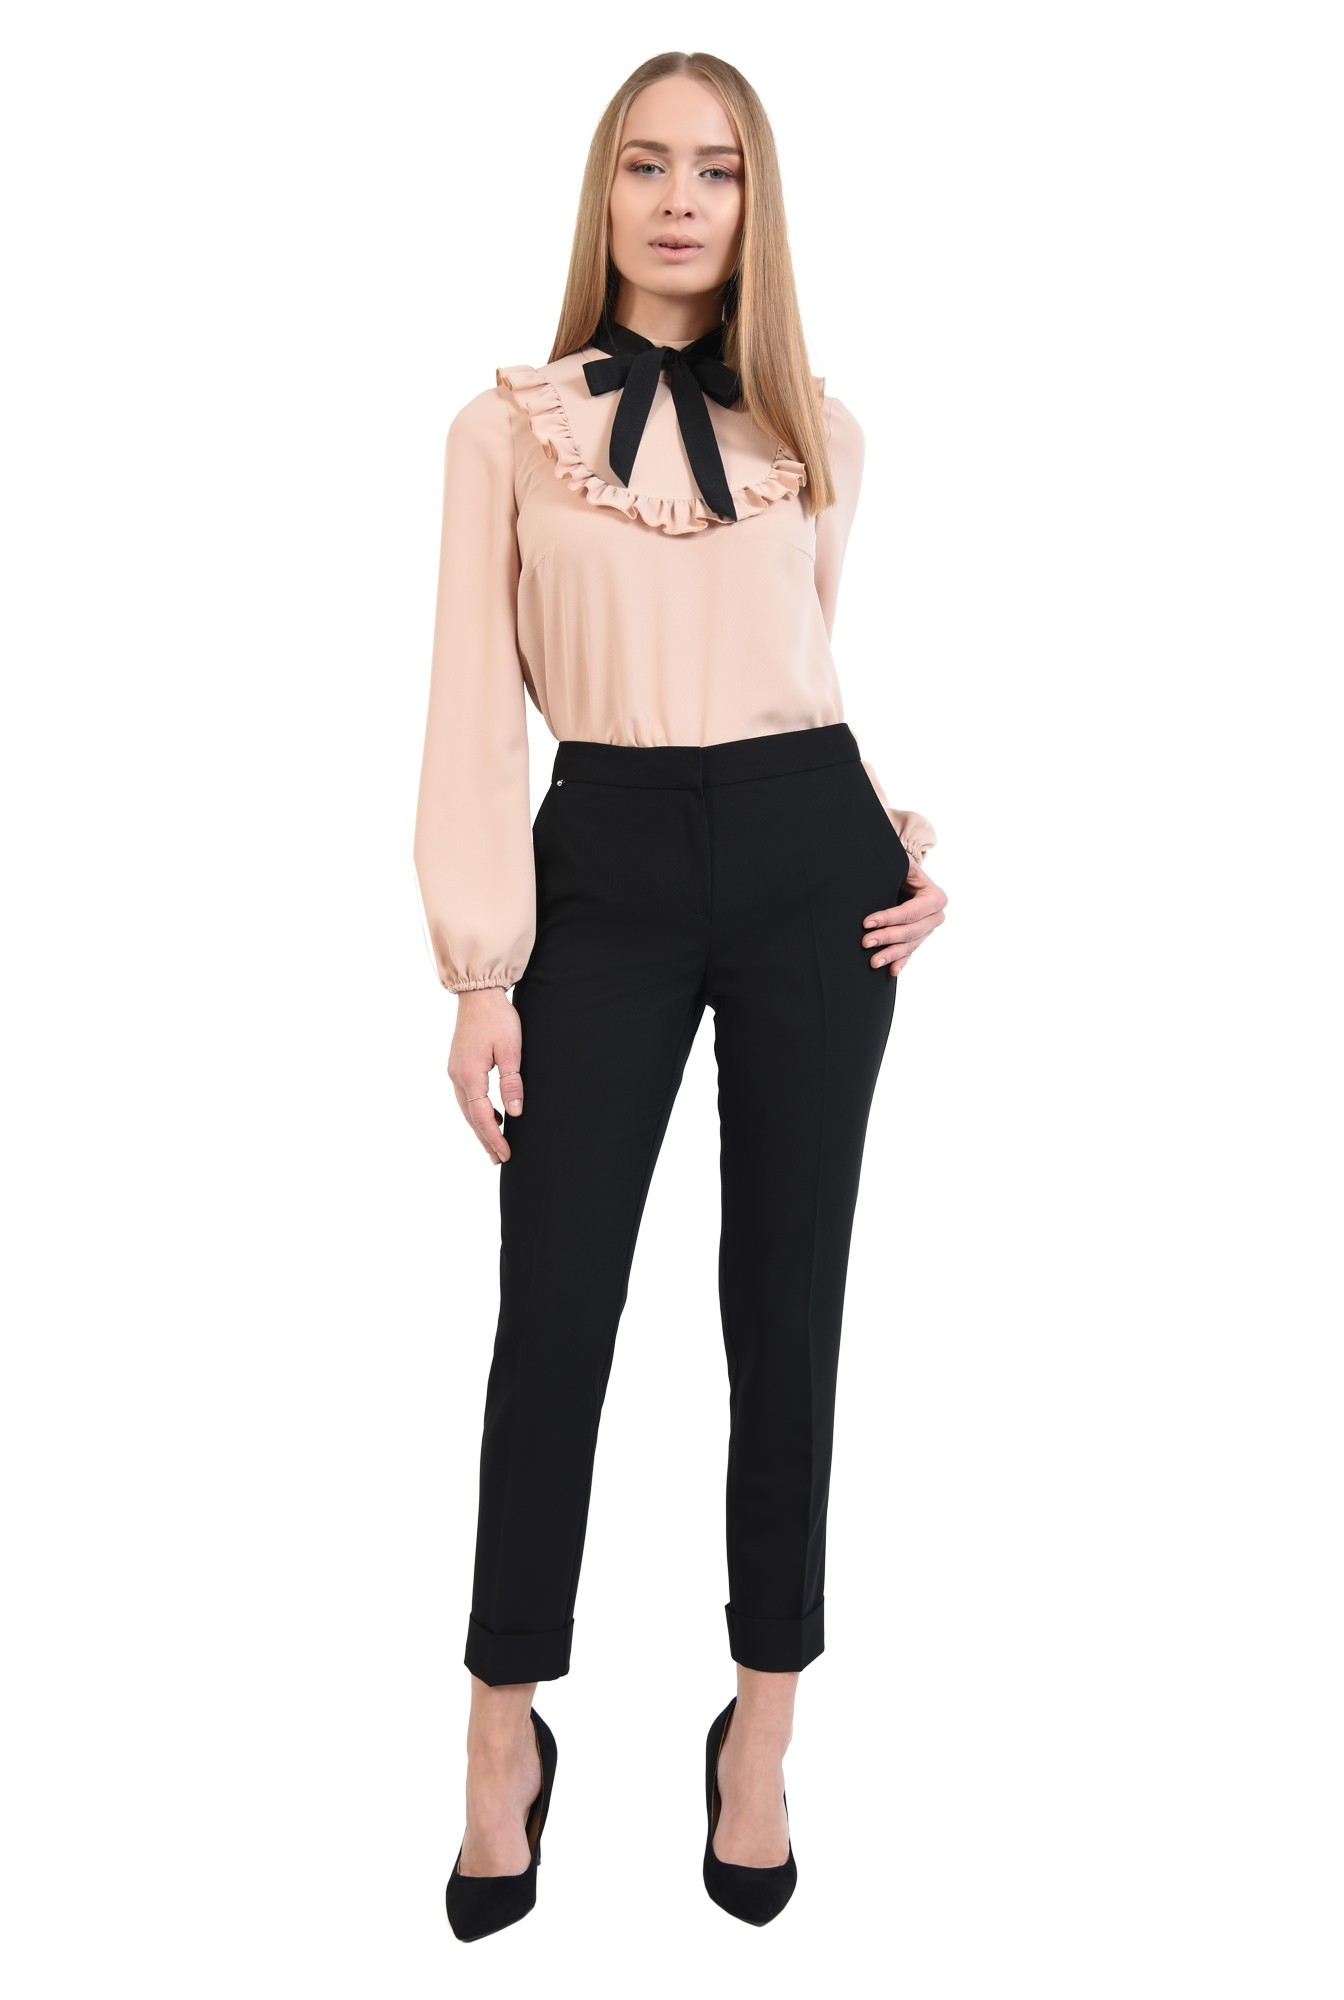 0 - pantaloni tigareta, cu mansete, cu talie medie, buzunare